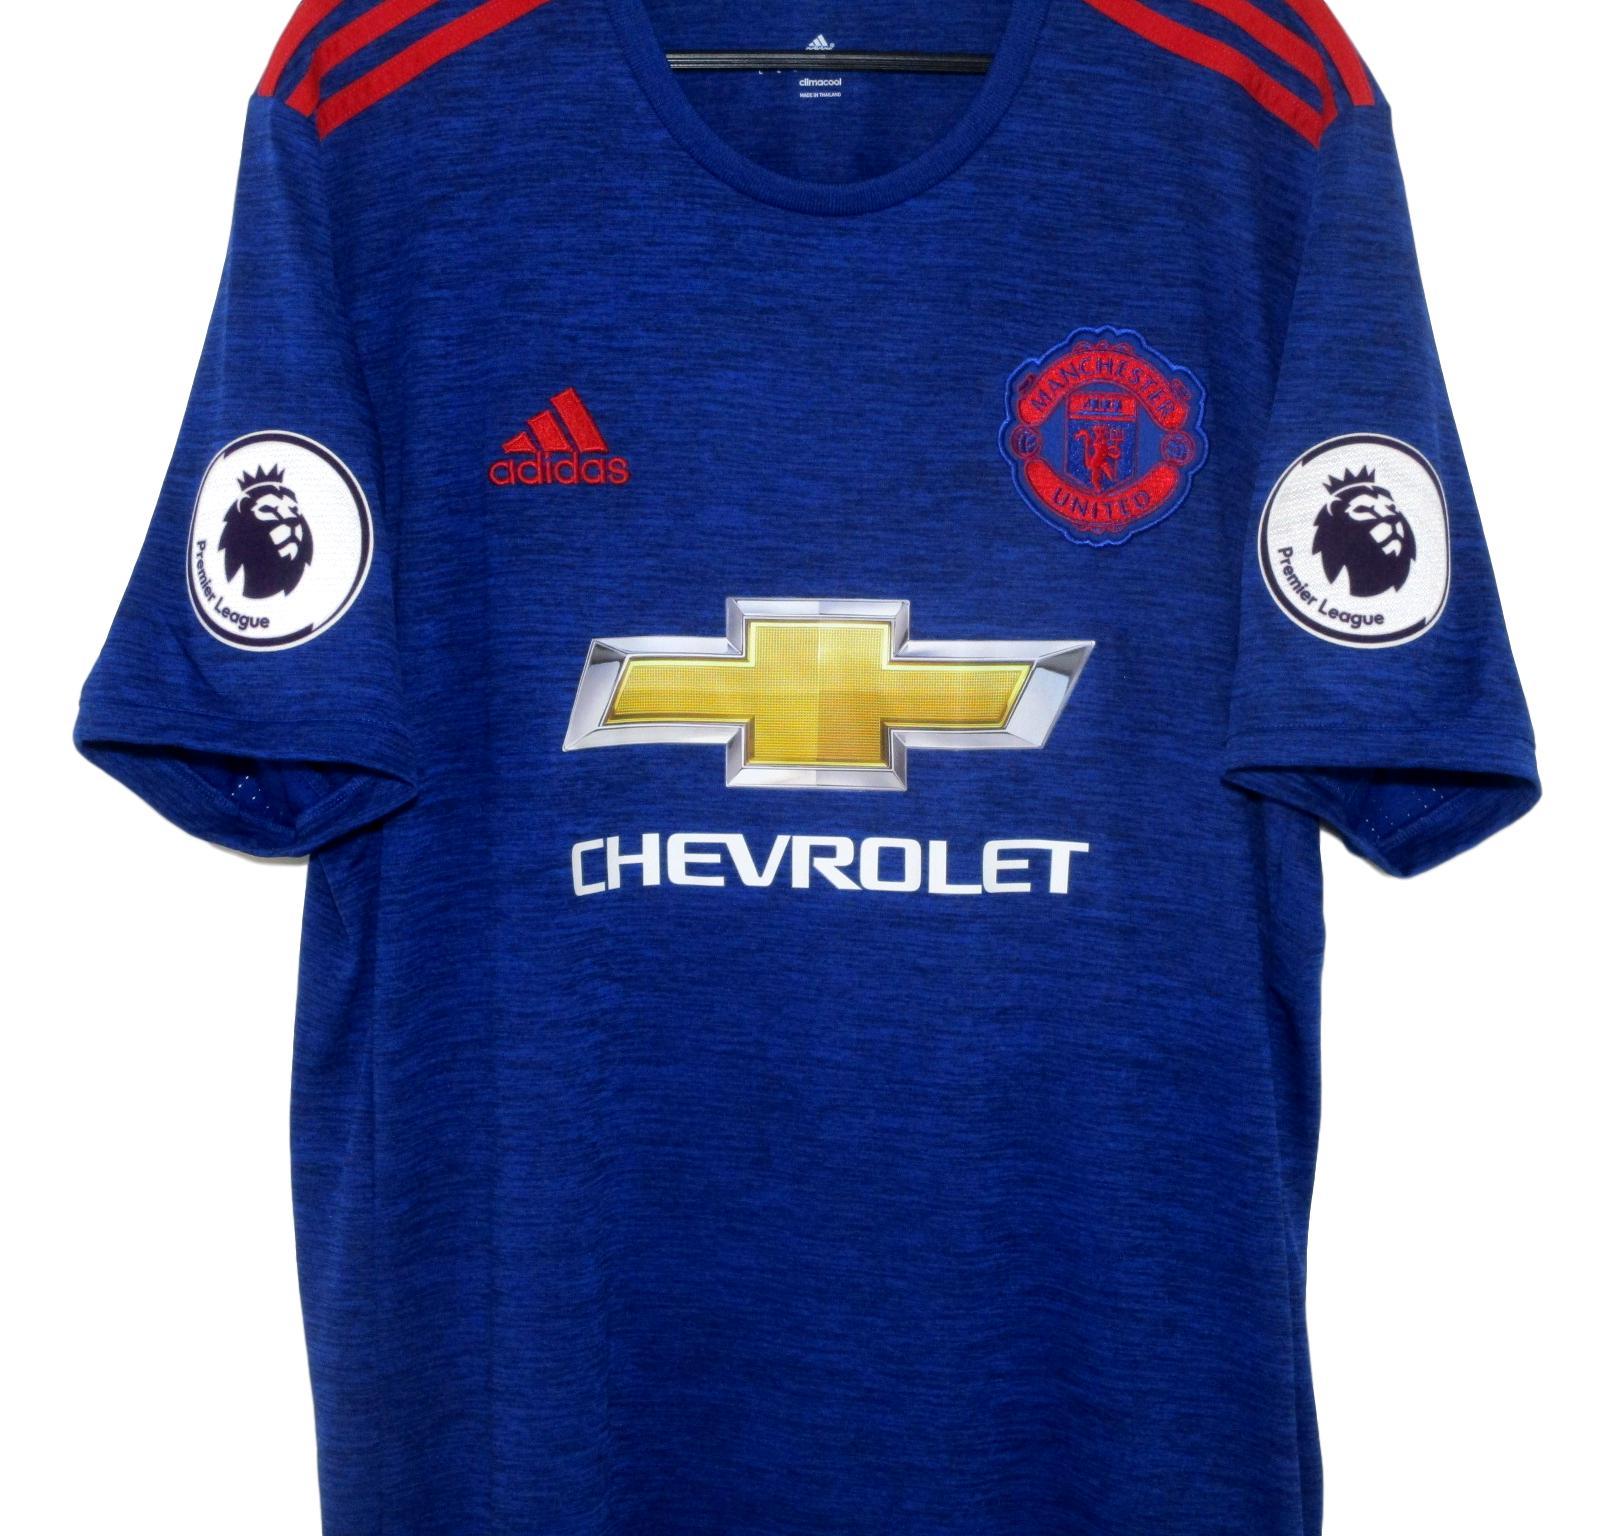 7b60918e0 2016-17 Manchester United Away Shirt Rooney (L)